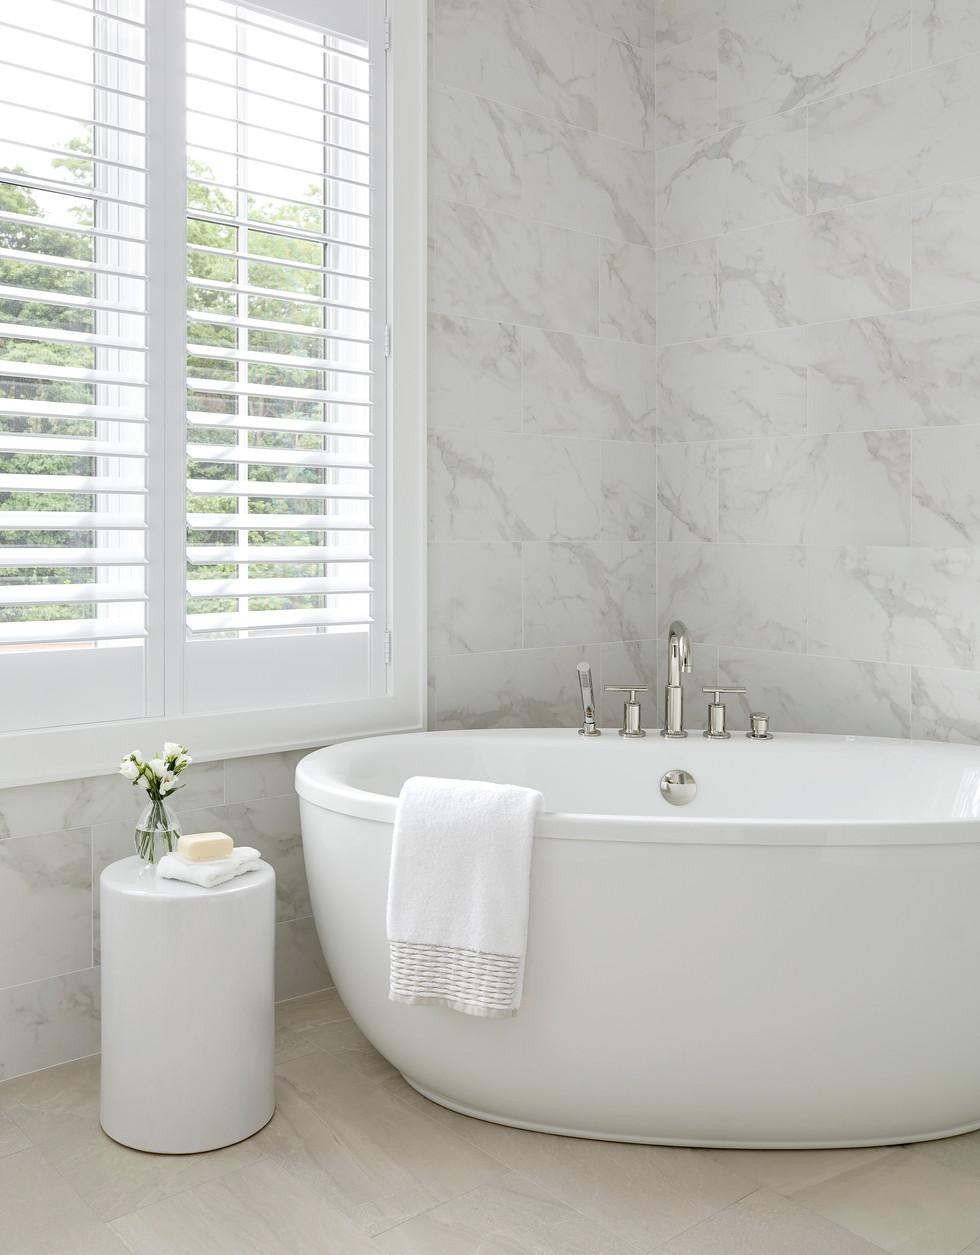 Kensington Bath.jpg